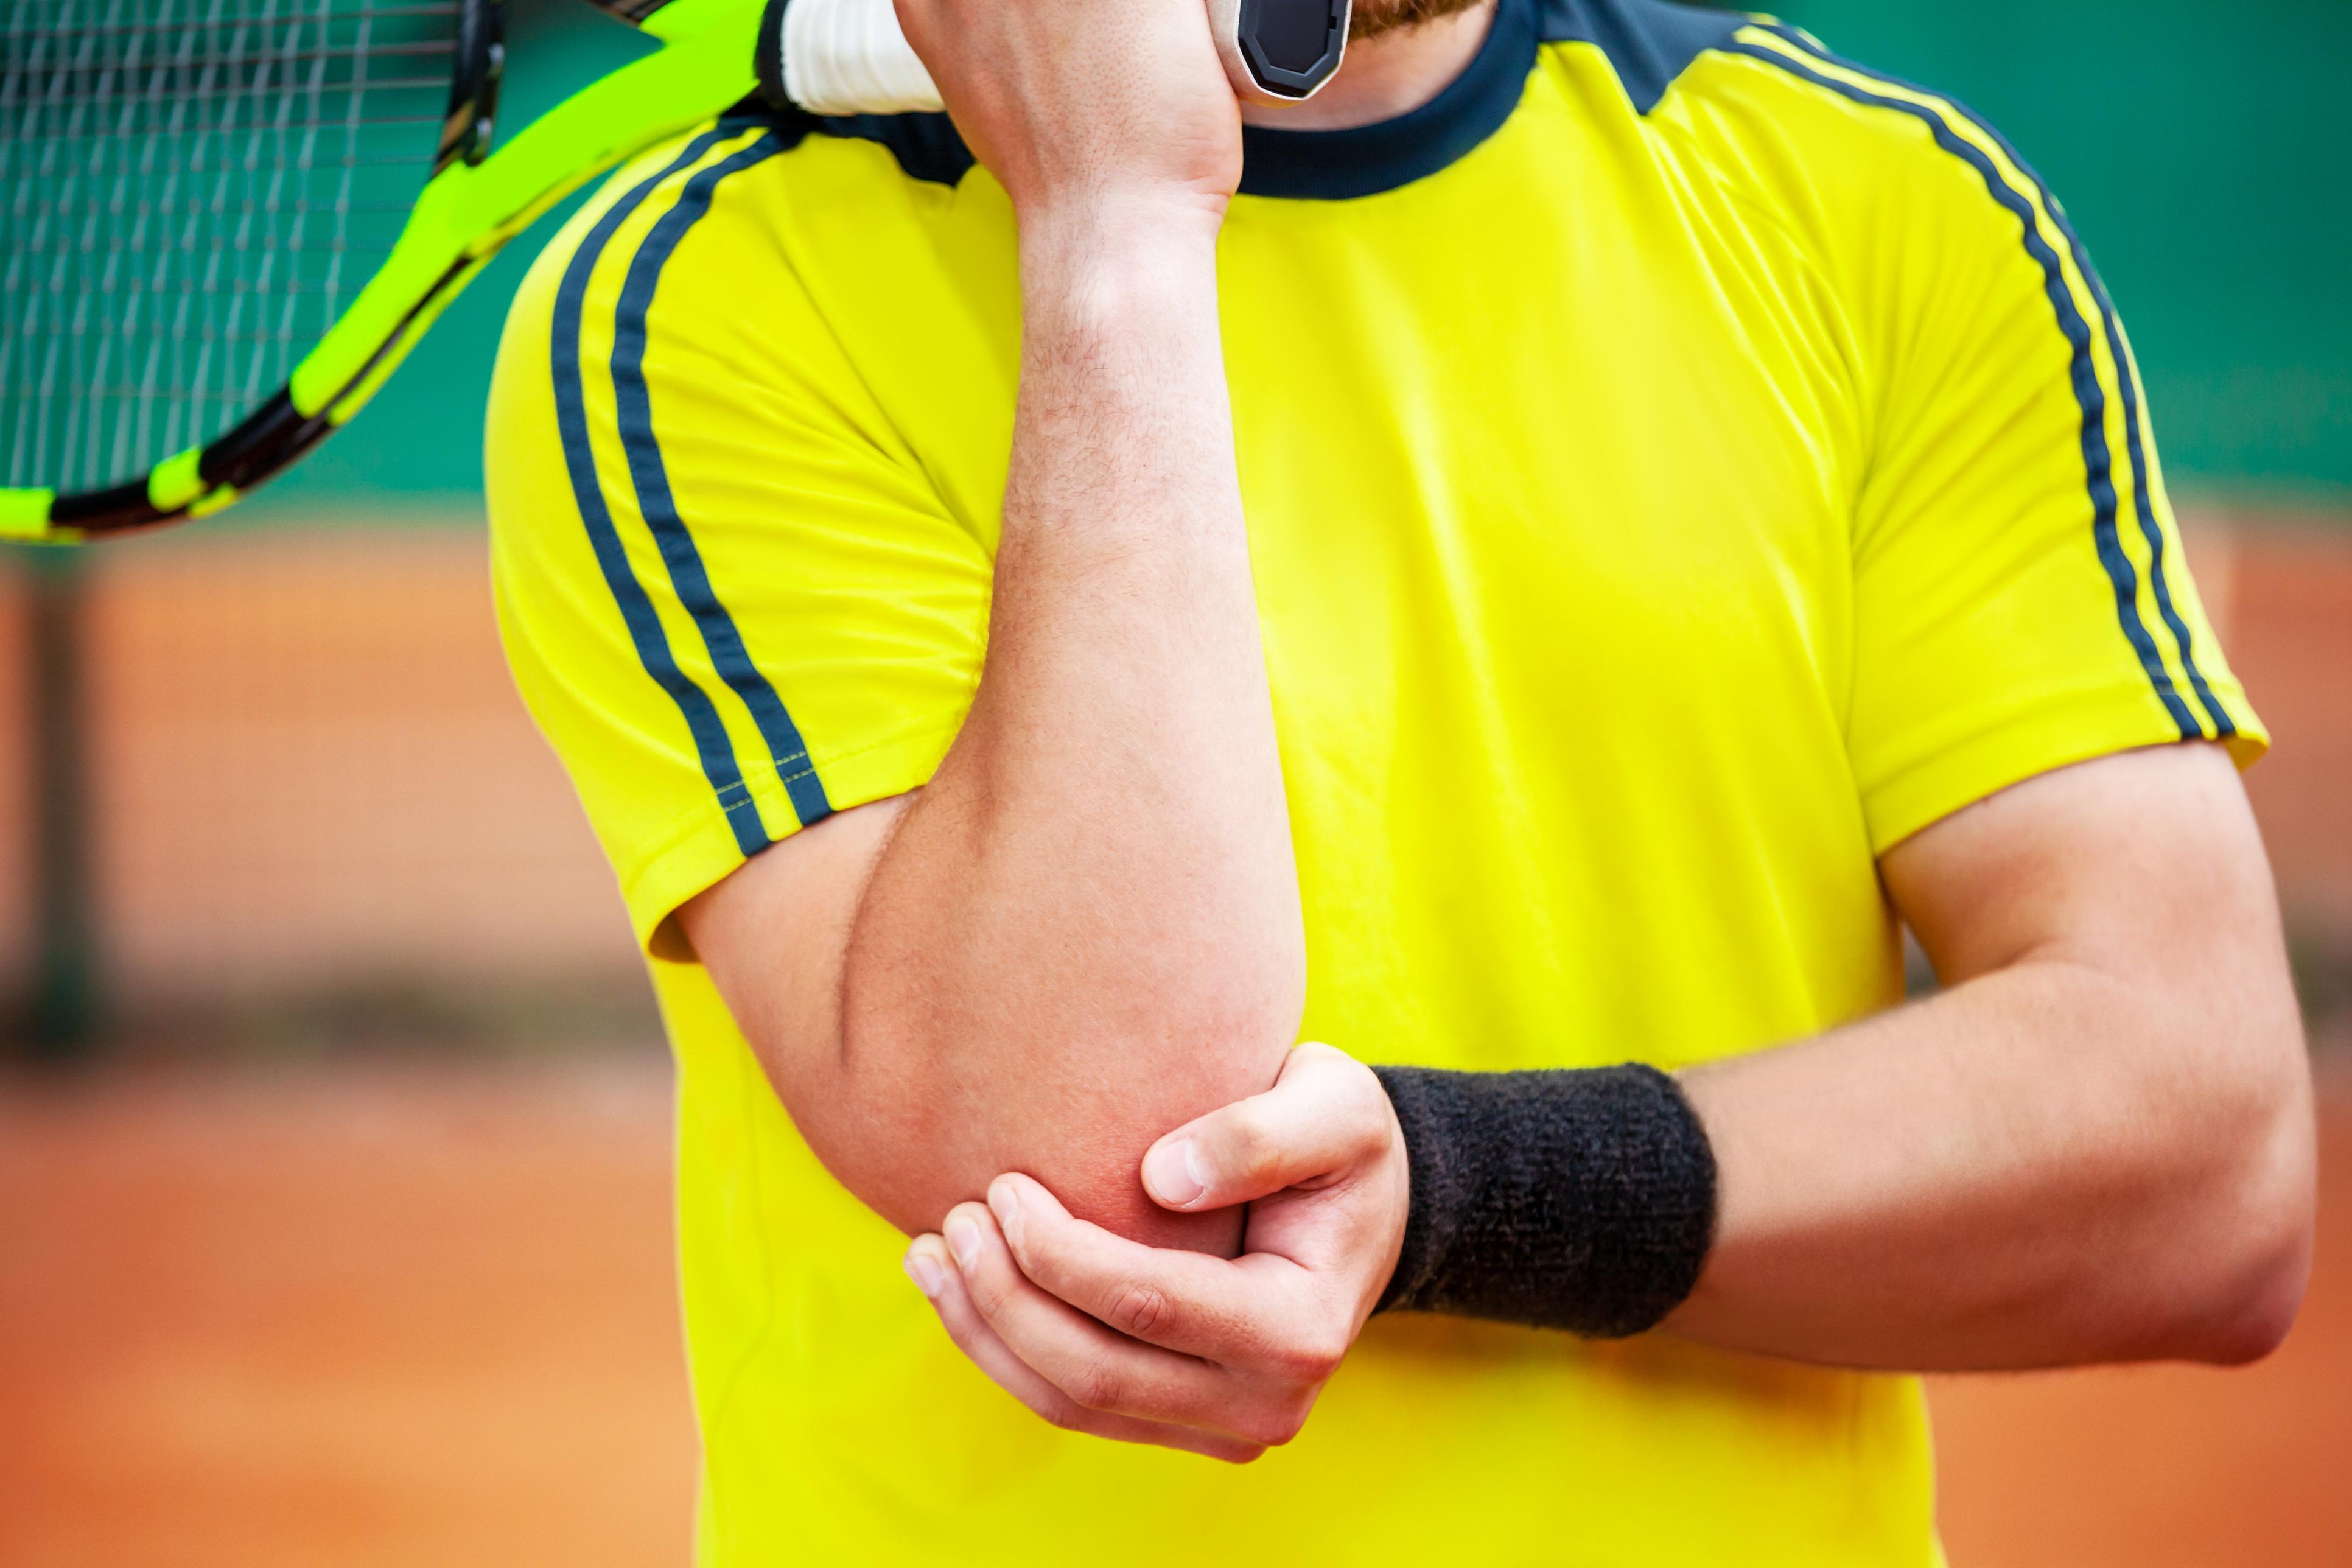 tennis injuries on elbow